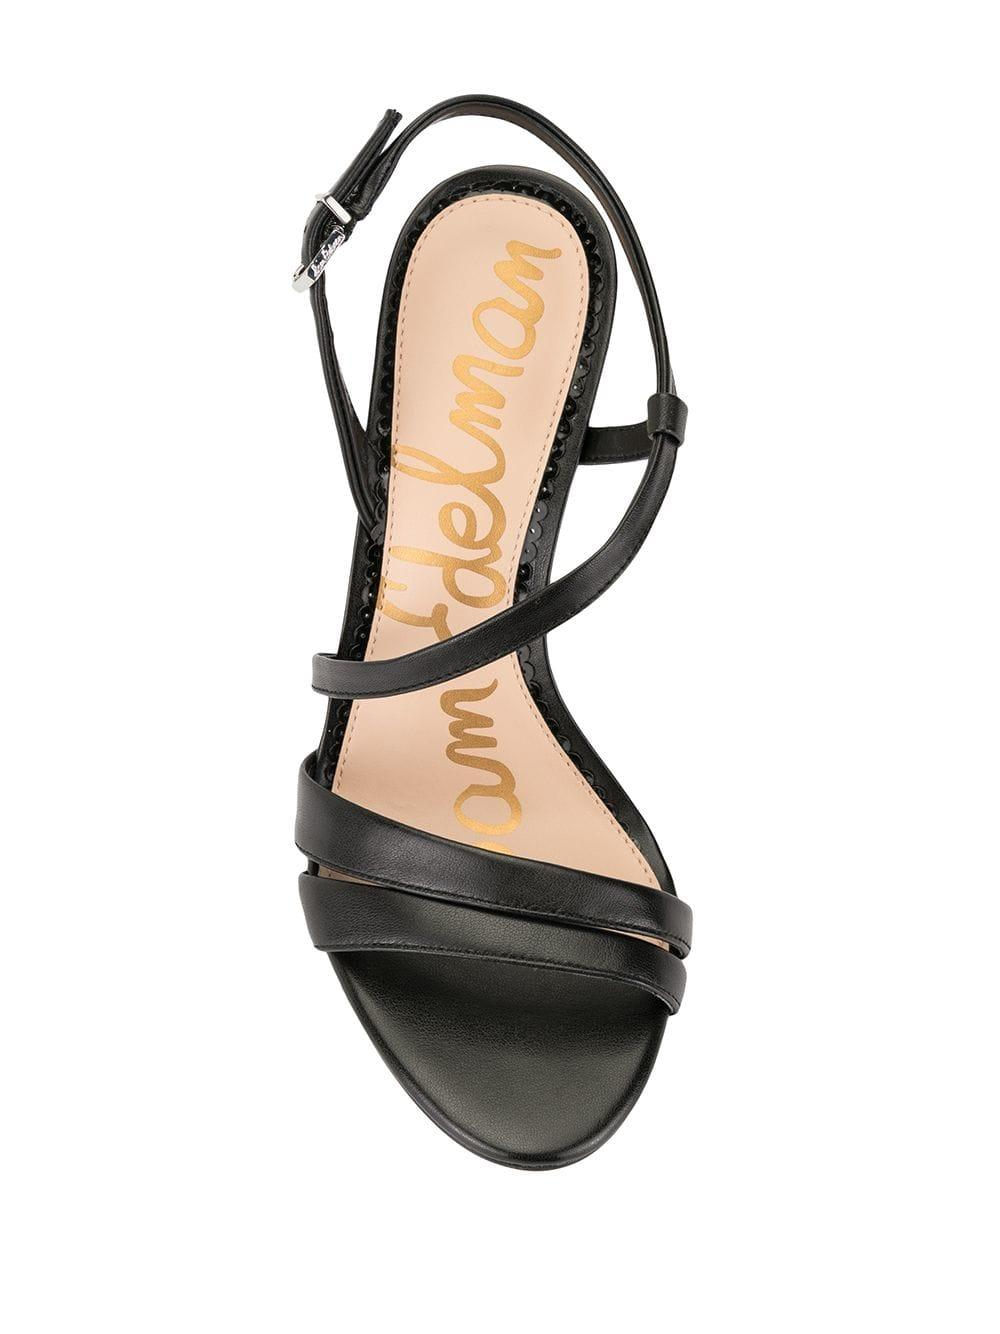 153b44342ee Sam Edelman - Black Alessandra Strappy Heeled Sandals - Lyst. View  fullscreen